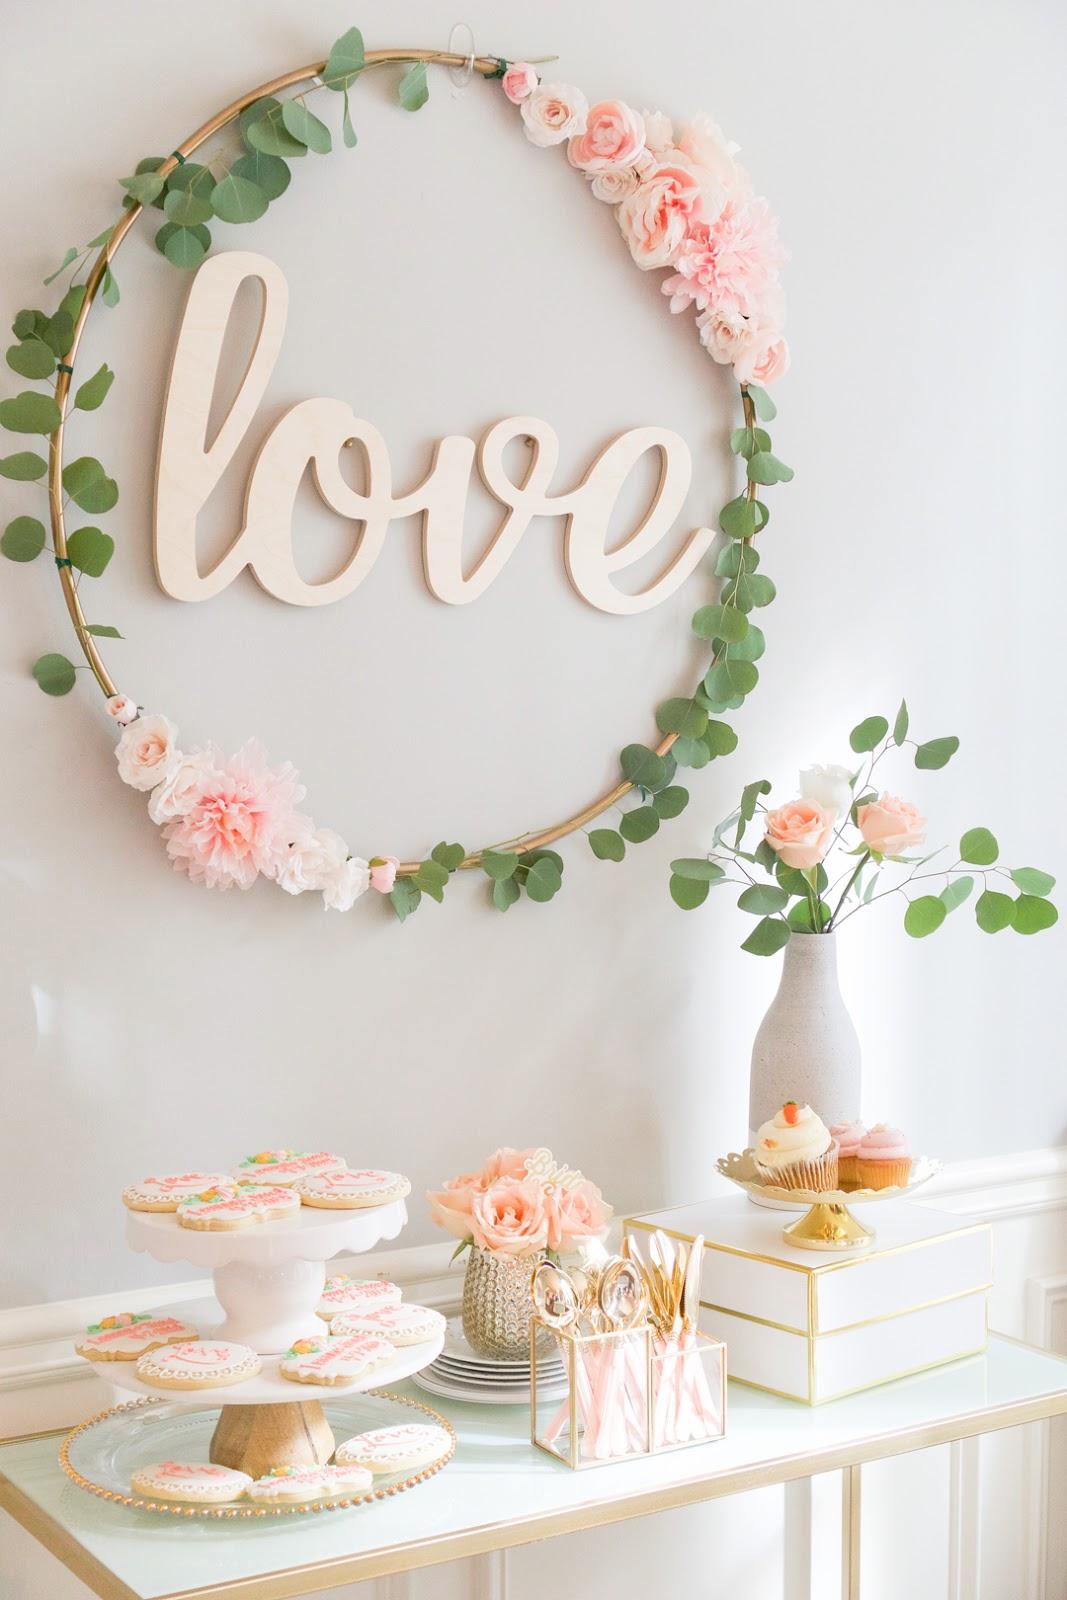 Coronas de flores para decorar + Sorteo_11